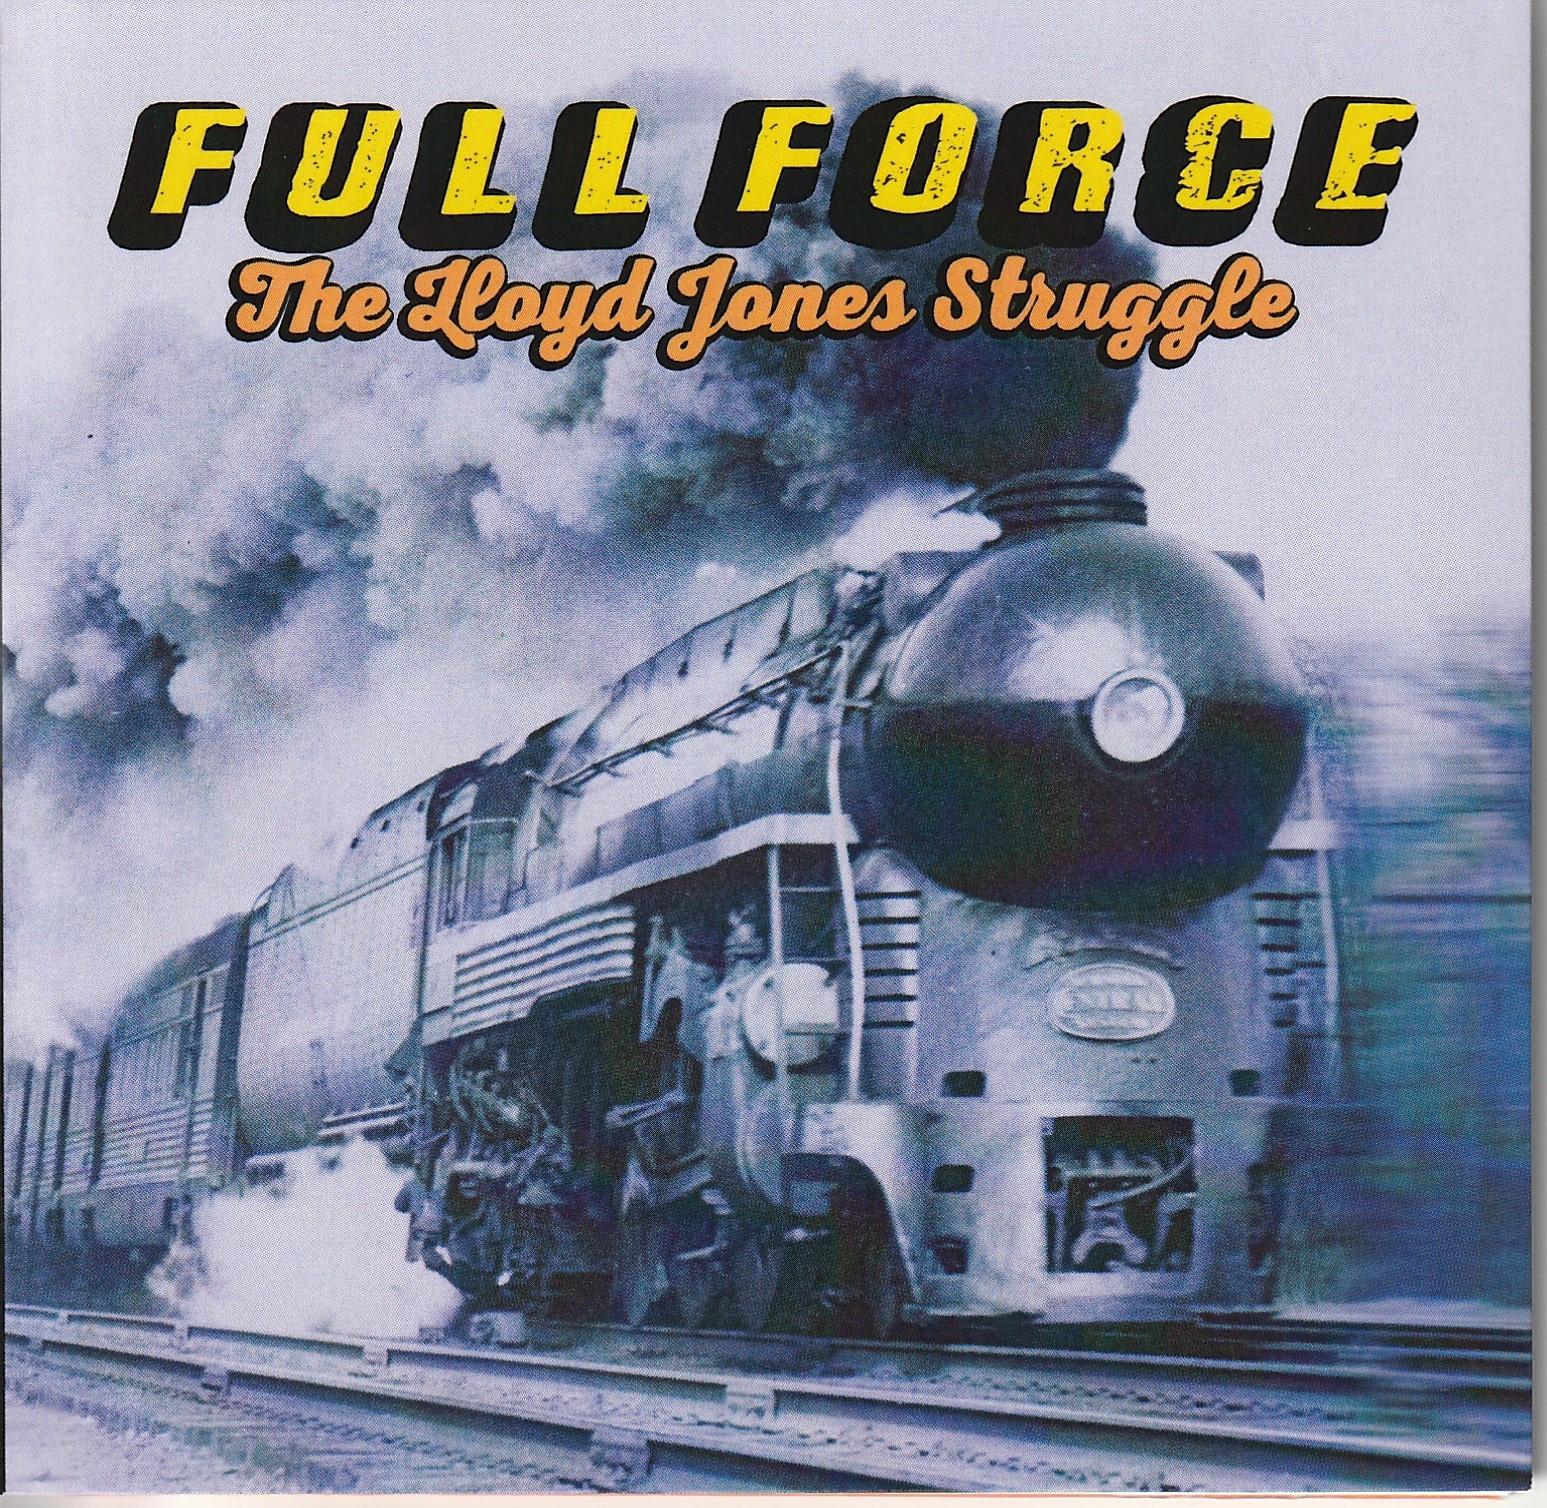 The Lloyd Jones Struggle – Full Force  (Self Released)